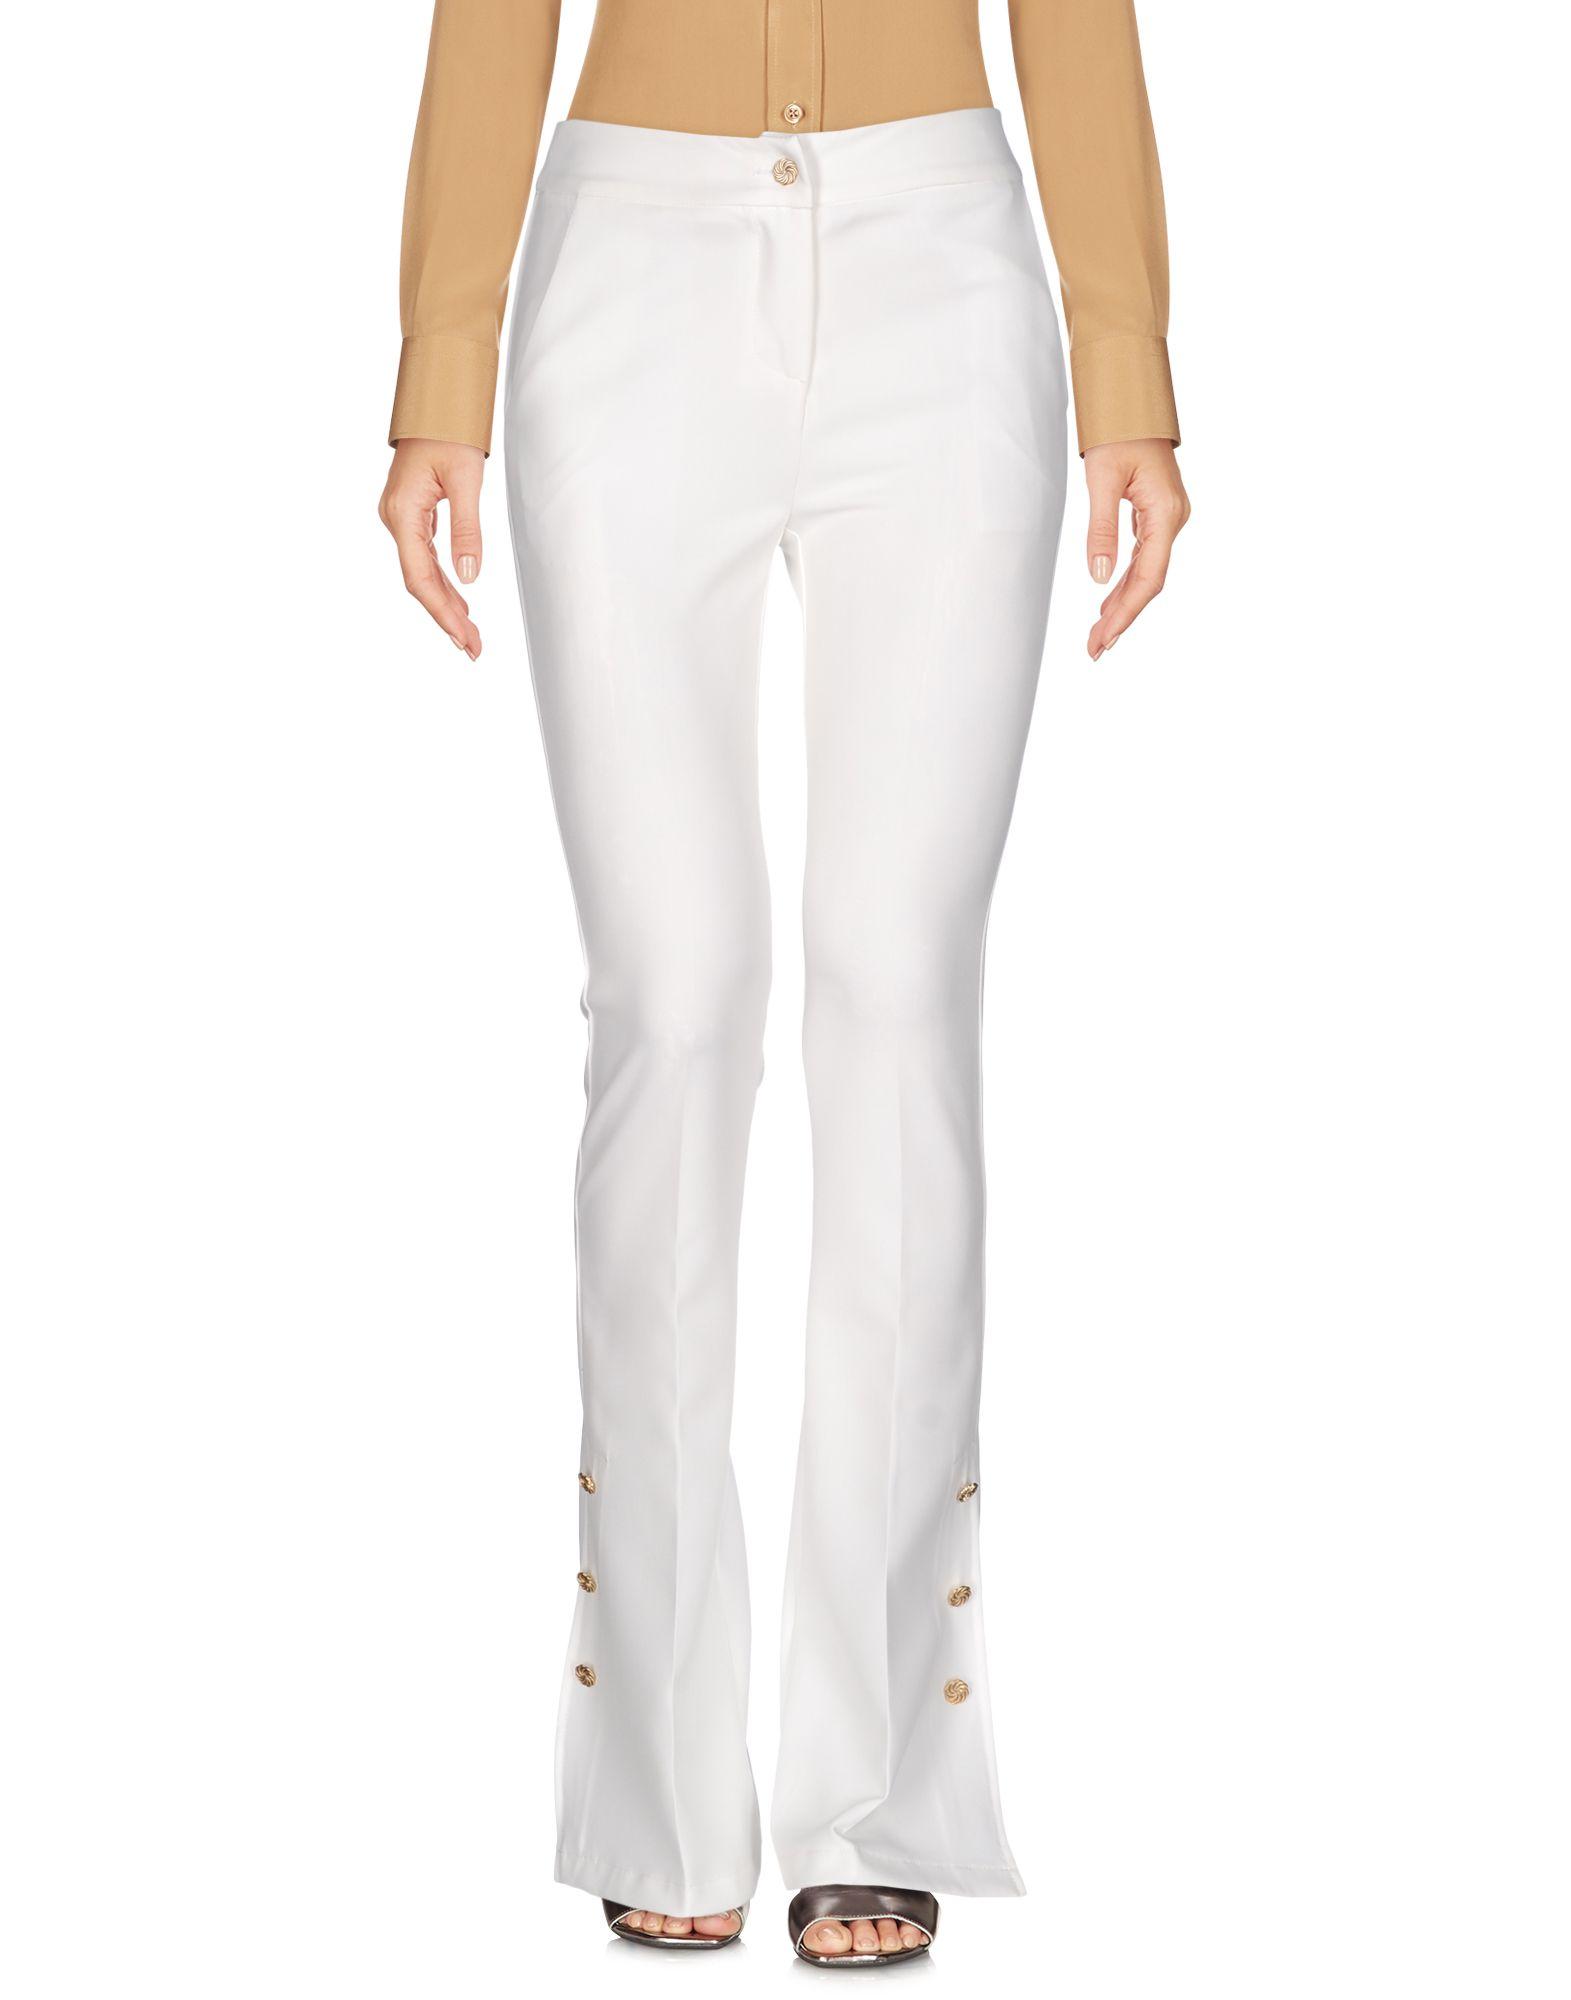 PAOLO CASALINI Повседневные брюки paolo casalini платье до колена